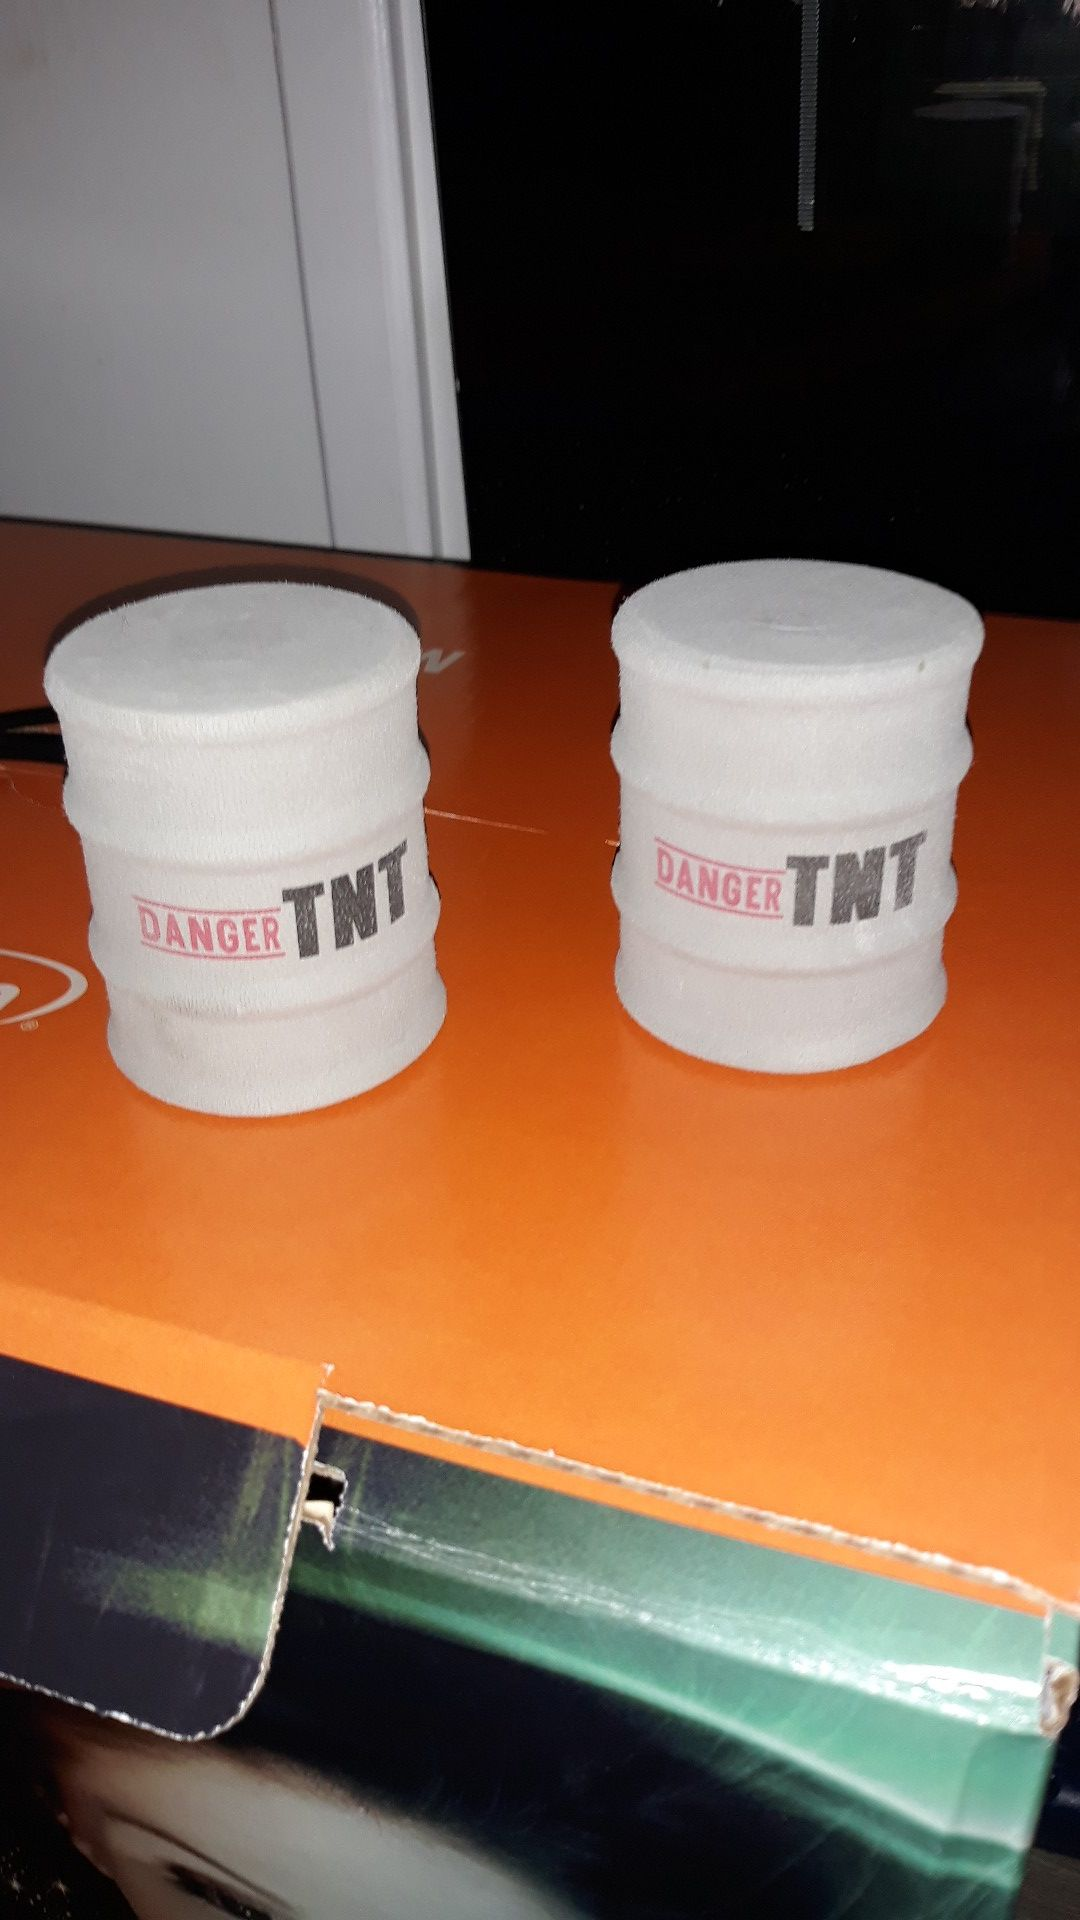 Fake TNT cans to shot nerf guns at